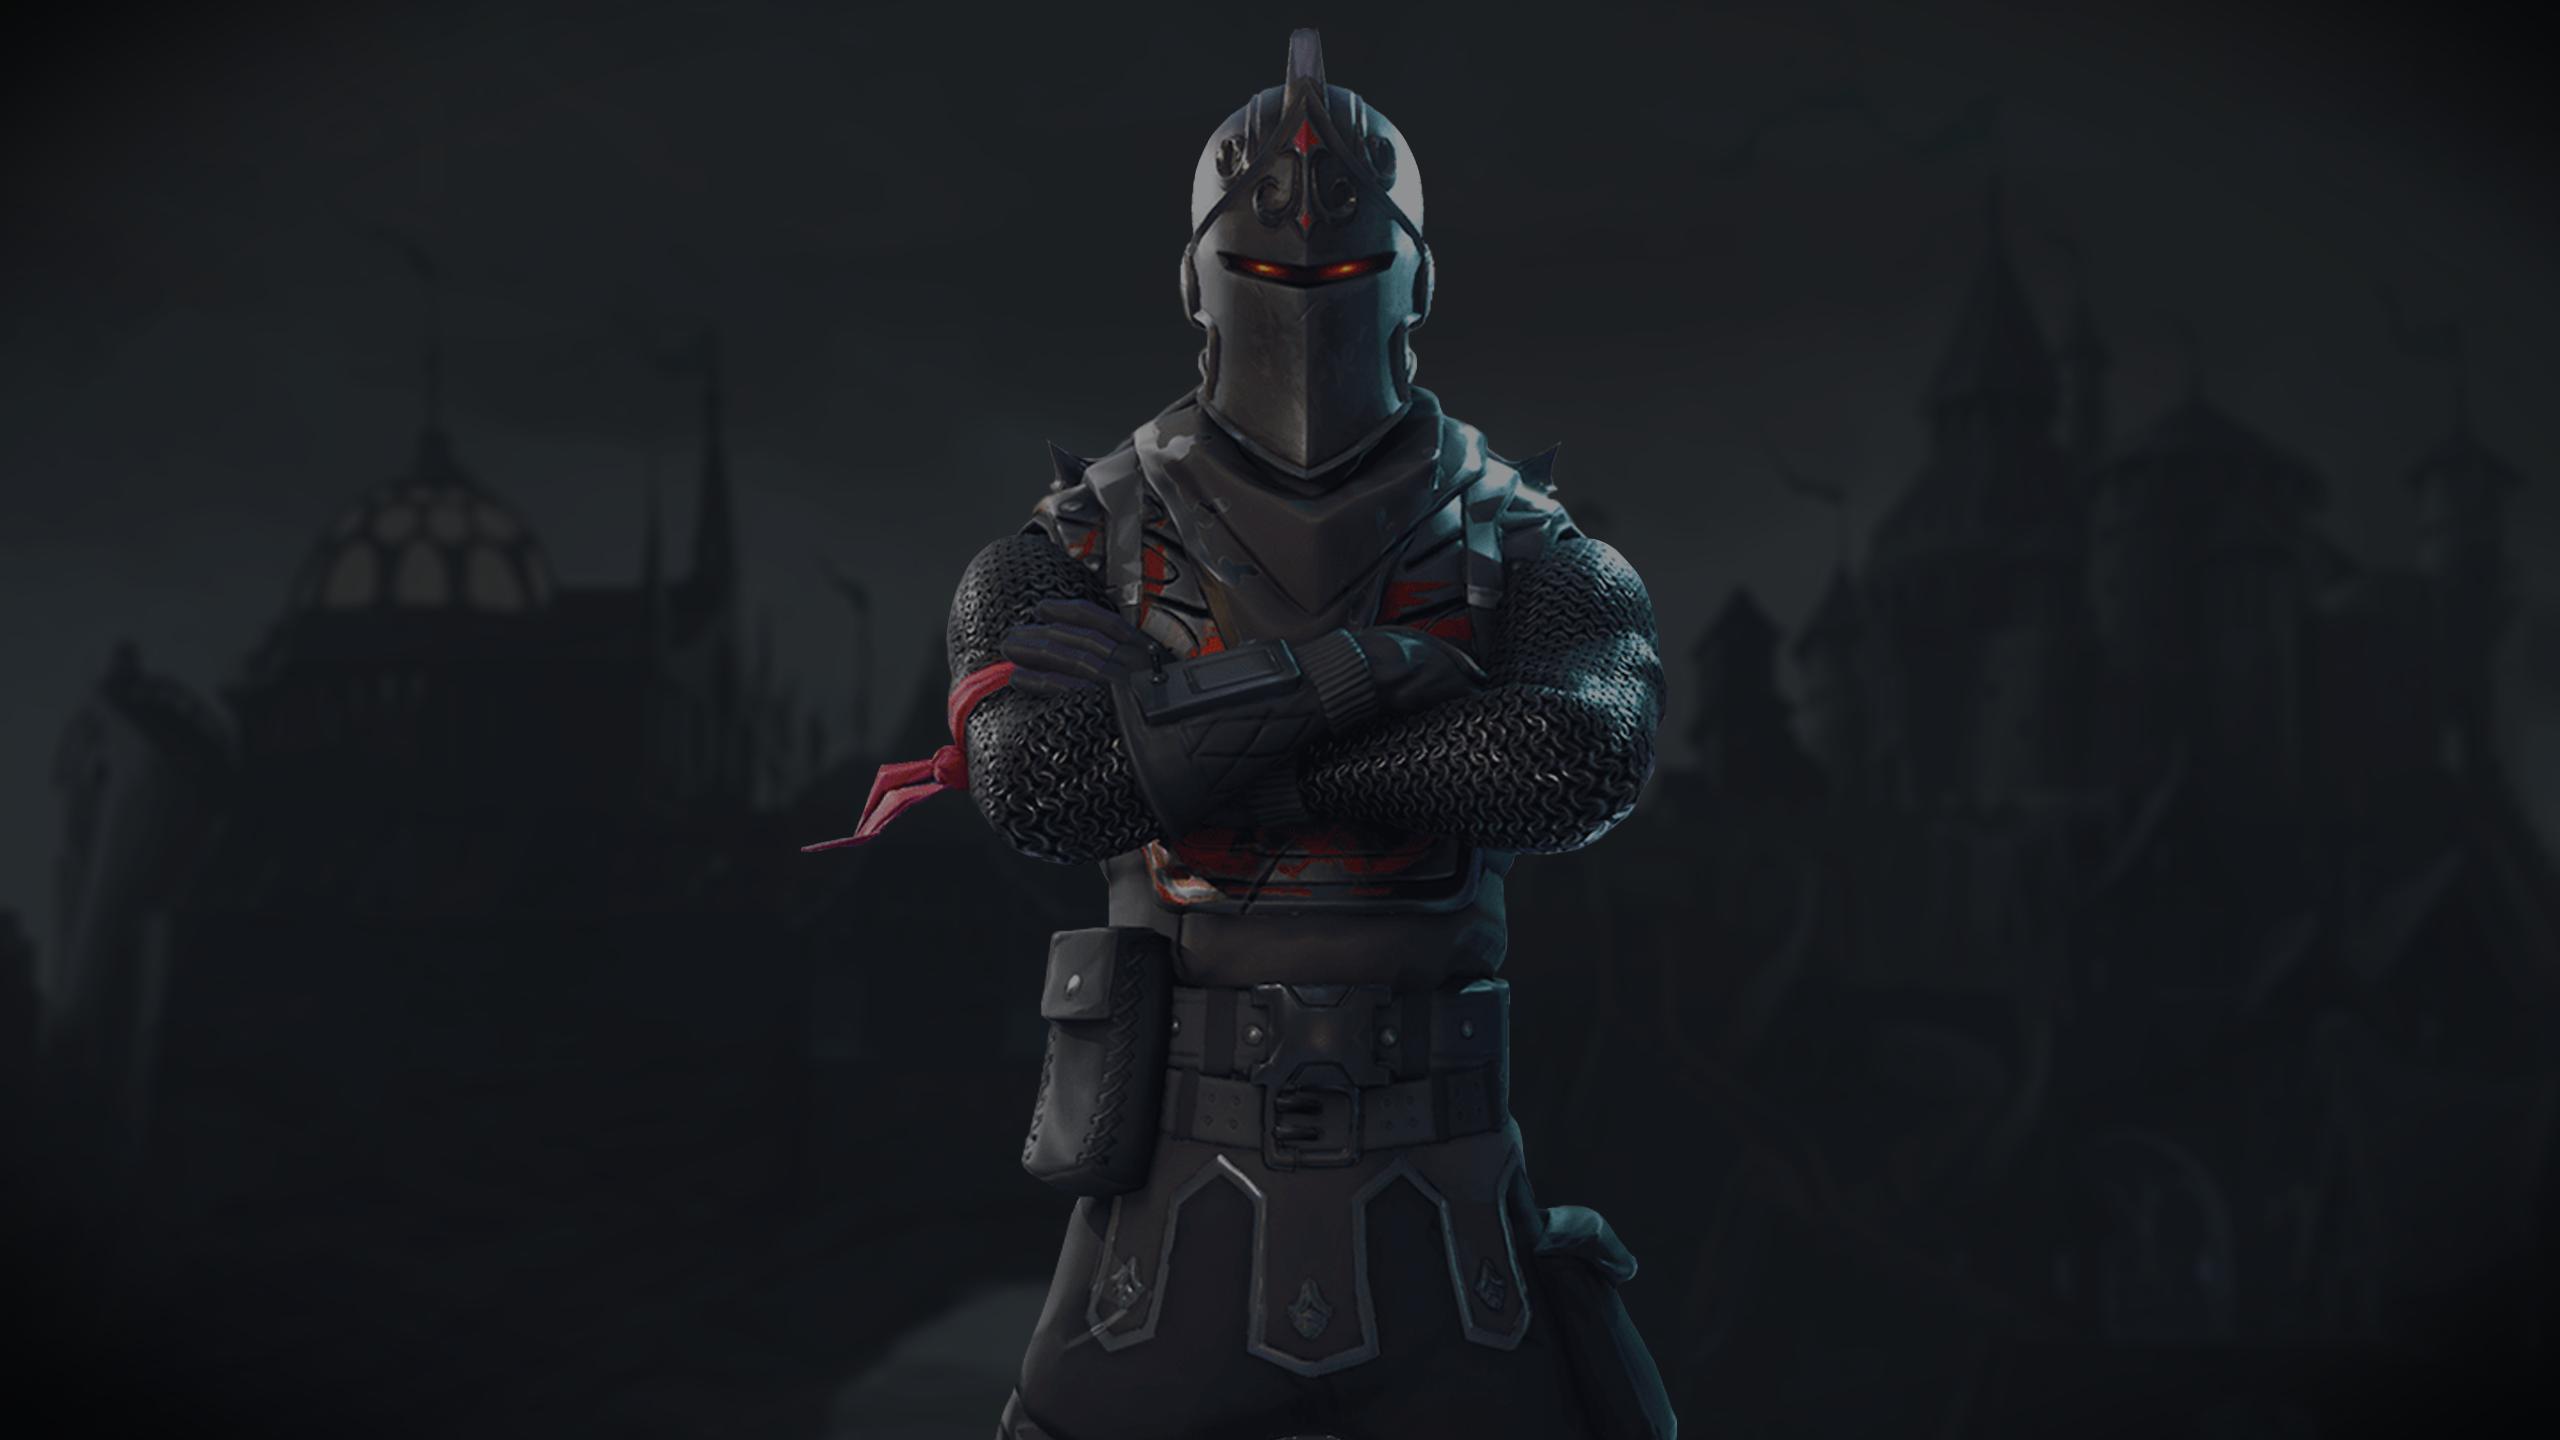 Black Knight wallpaper for you all to enjoy FortNiteBR 2560x1440